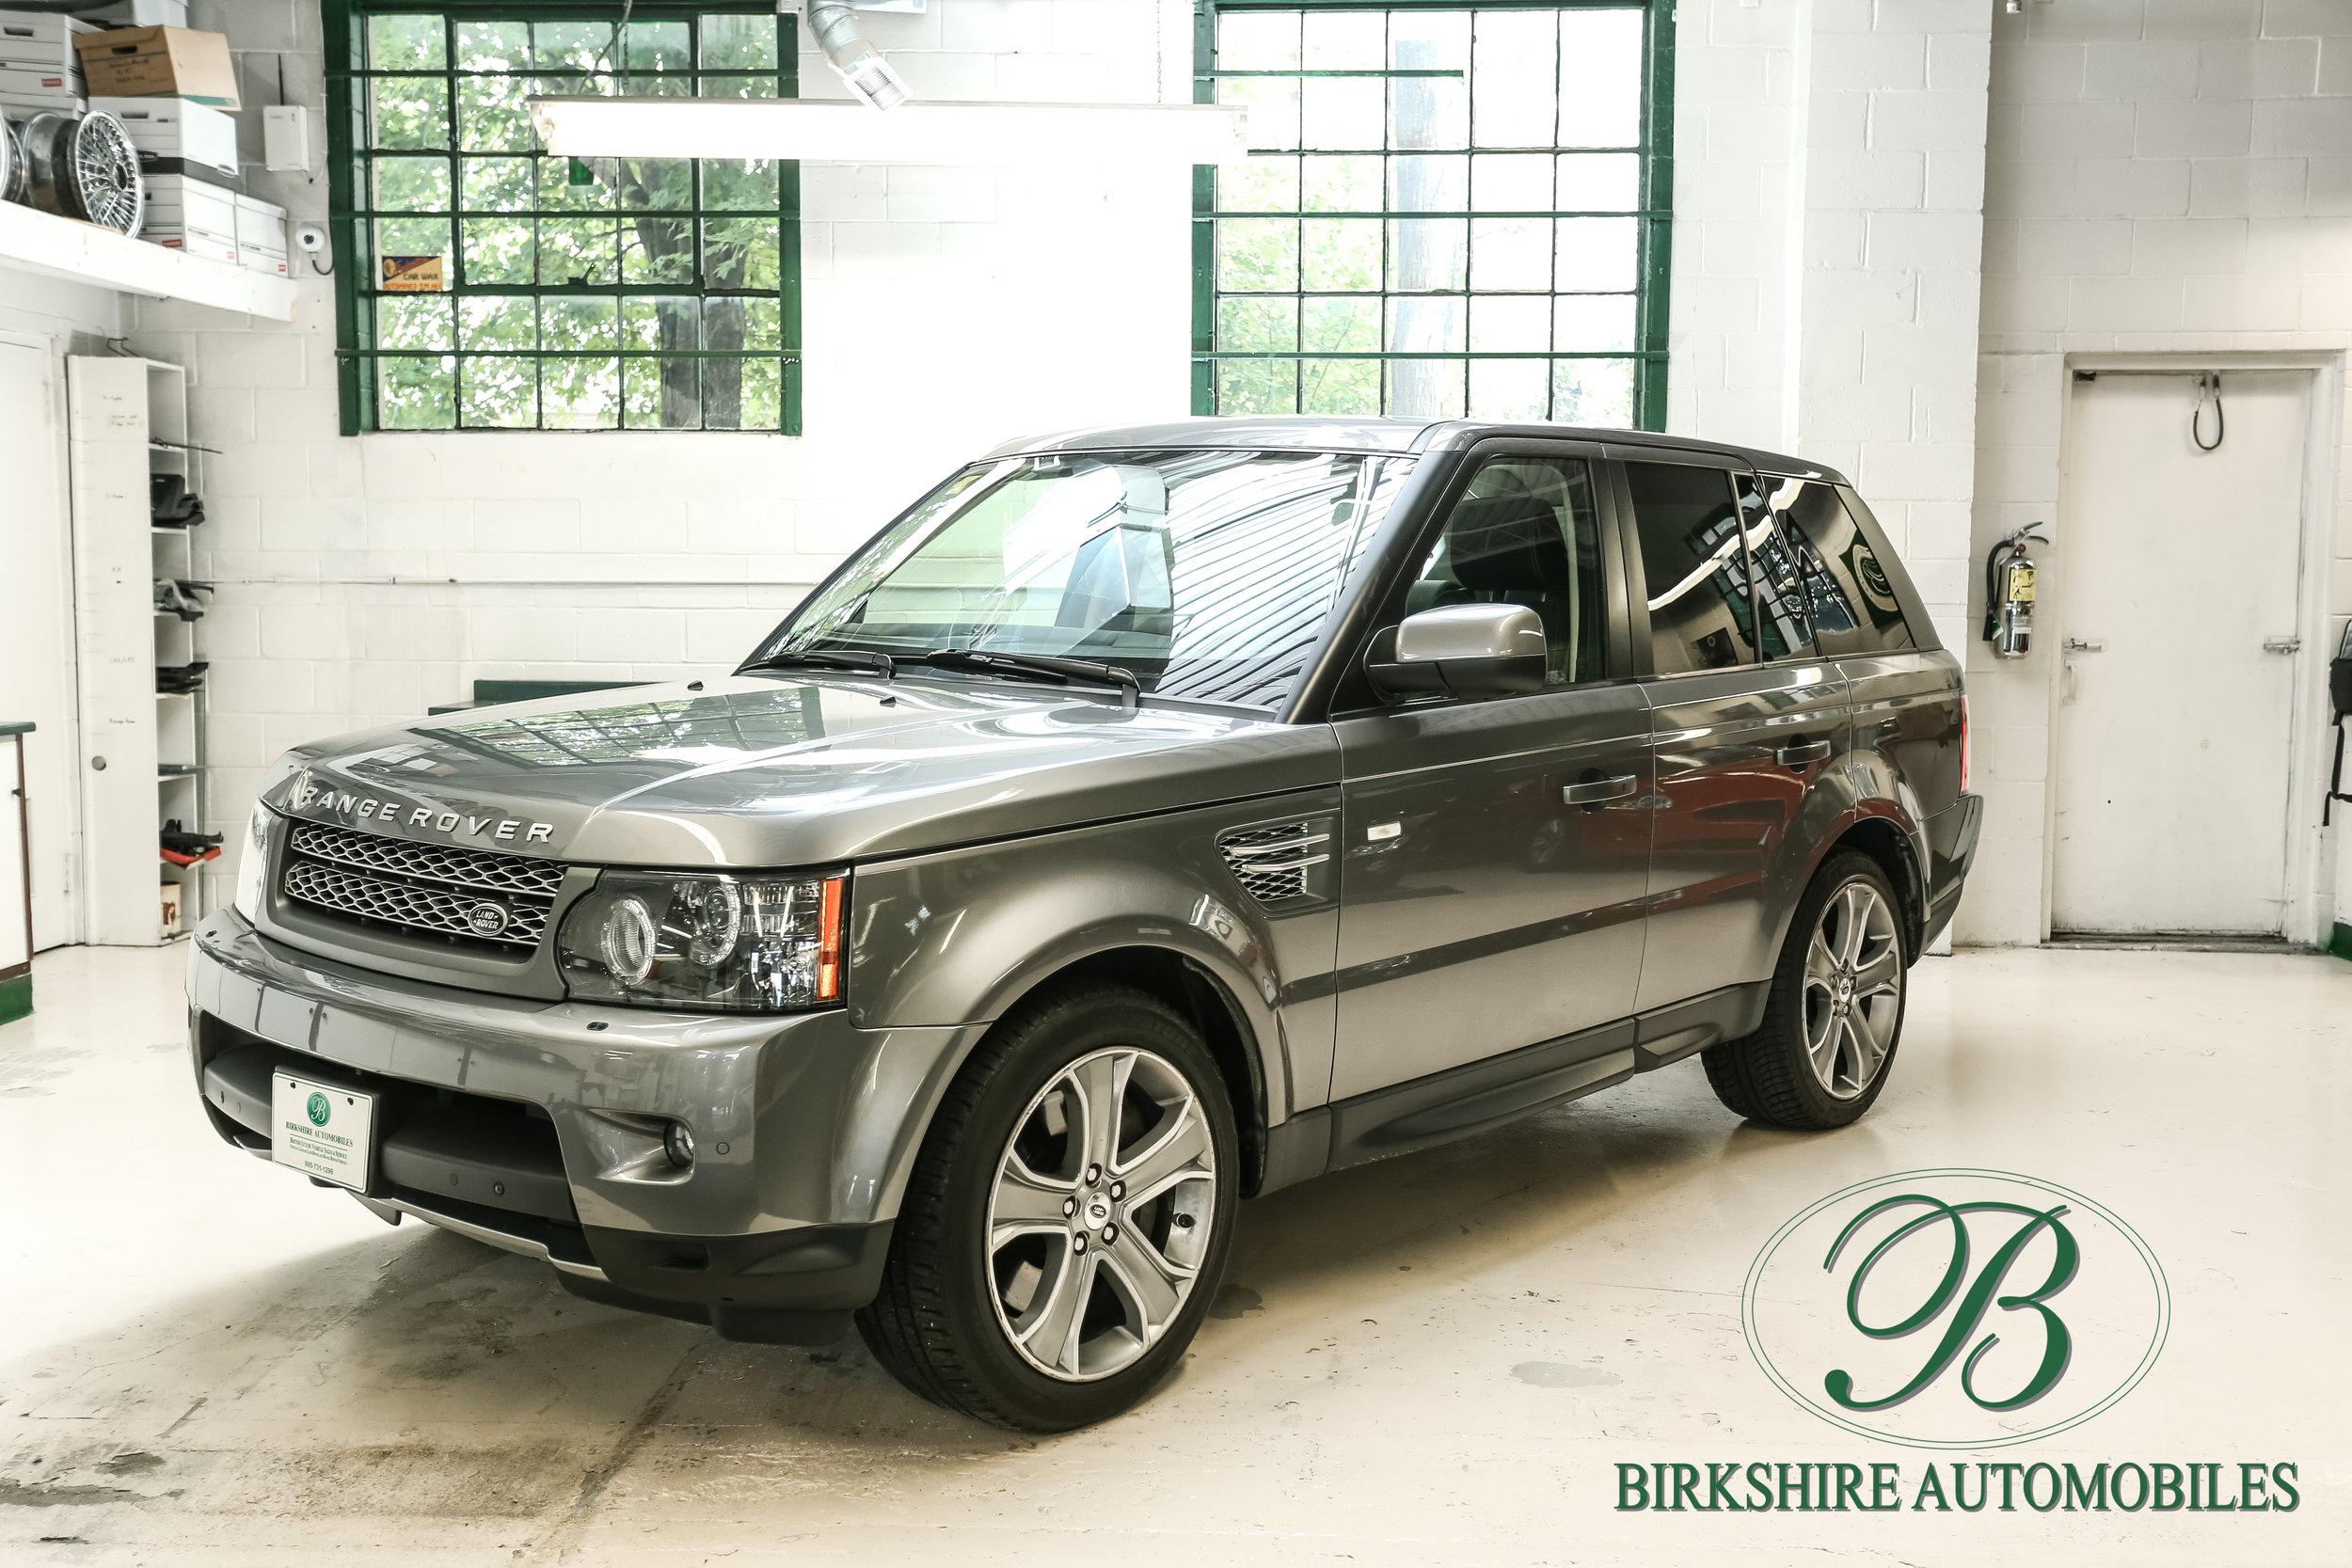 Birkshire Automobiles-2.jpg